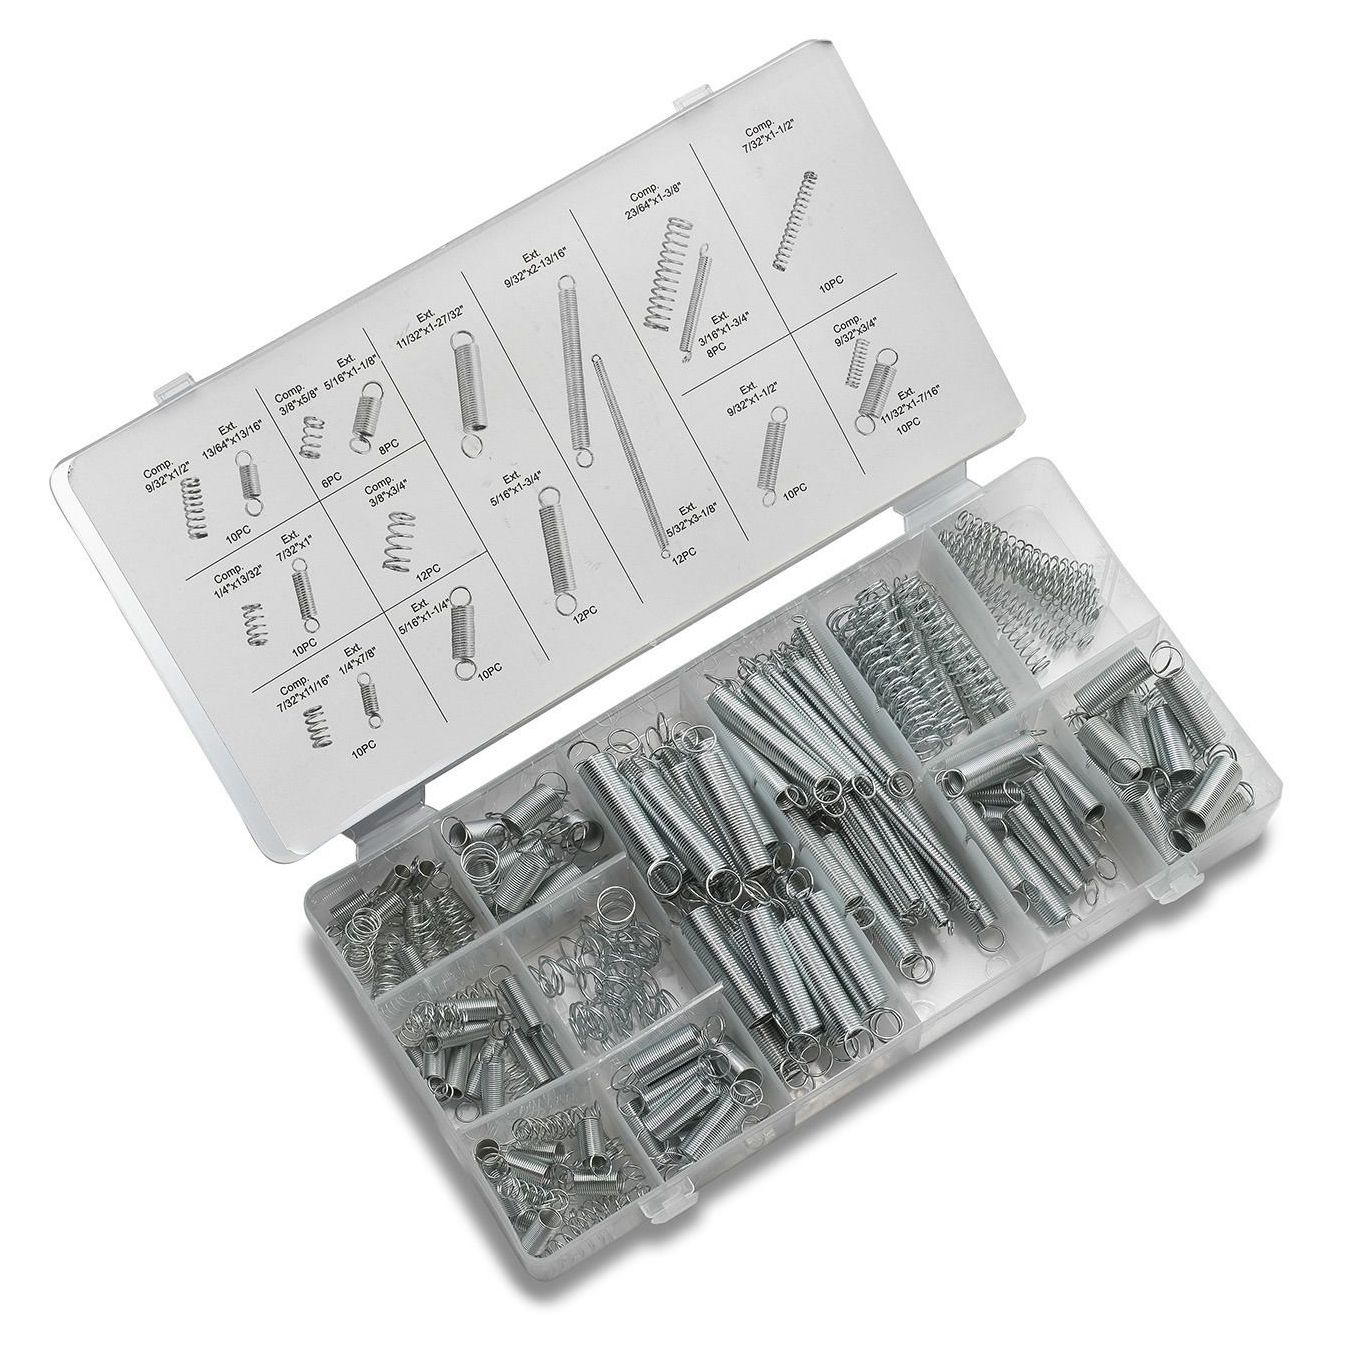 EWS-200pcs/lot Metal Hardware Spring Assortment Hardware Set Electrical Tension Compression Carburetor Extension Springs kit 200pcs lot 2sa950 y 2sa950 a950 to 92 transistors